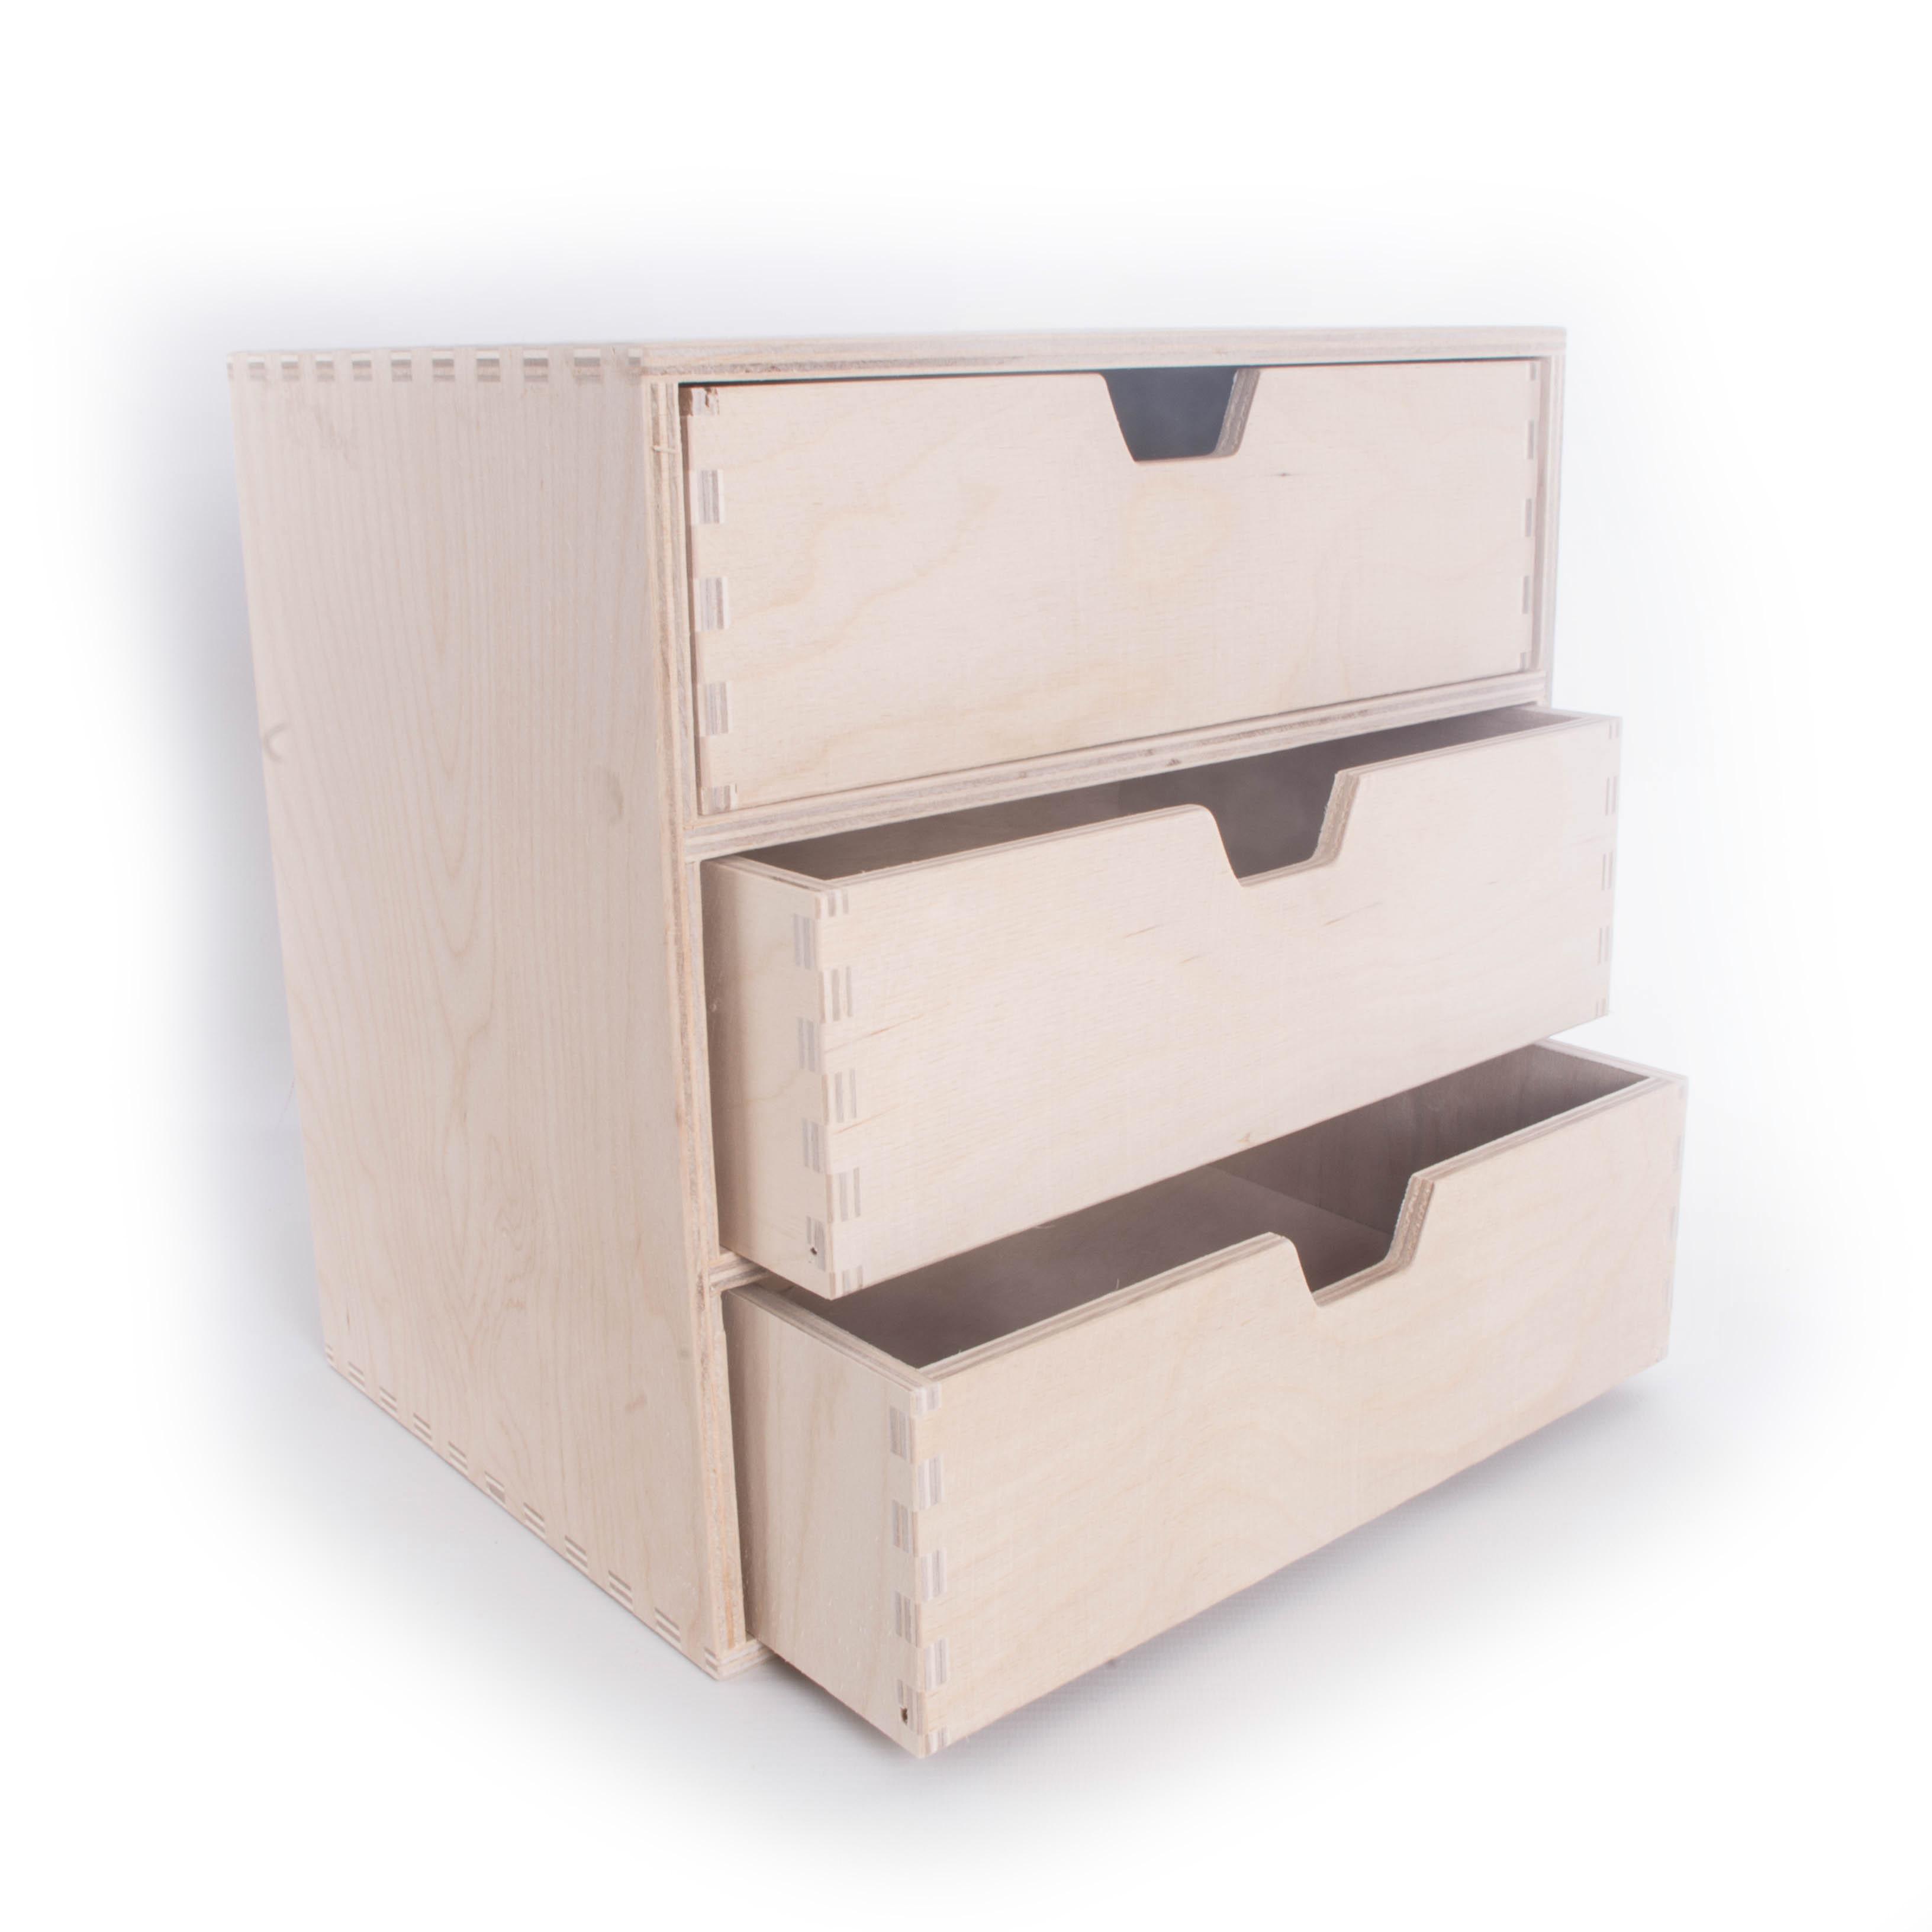 Details About Plain Wooden Cupboard Keepsake Storage Box With 3 Drawersunpainted Craft Chest